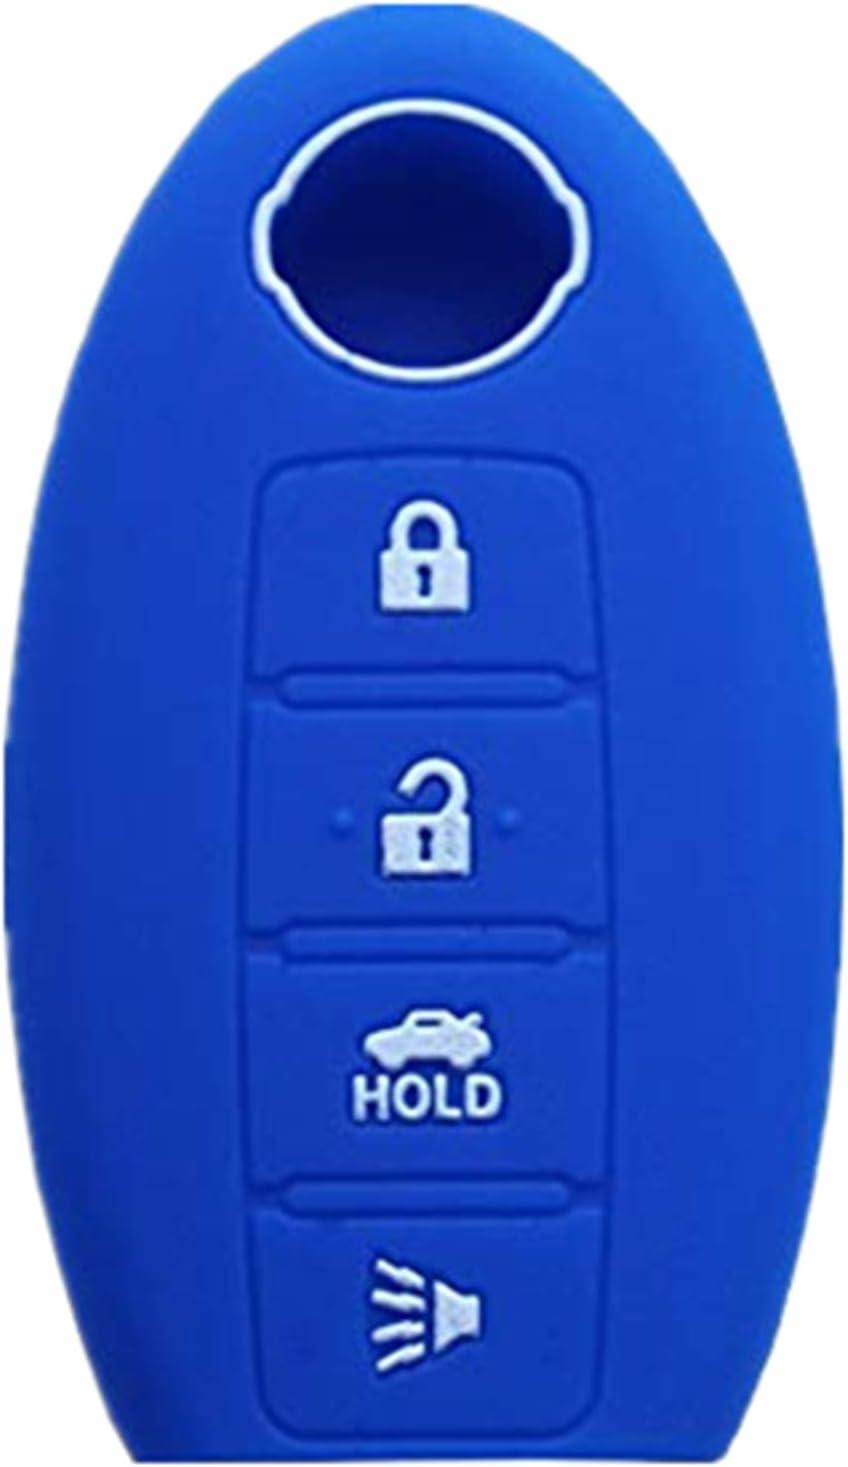 Blue Rpkey Silicone Keyless Entry Remote Control Key Fob Cover Case protector For Nissan Altima Maxima Murano Versa 285E3-JA05A KR55WK48903